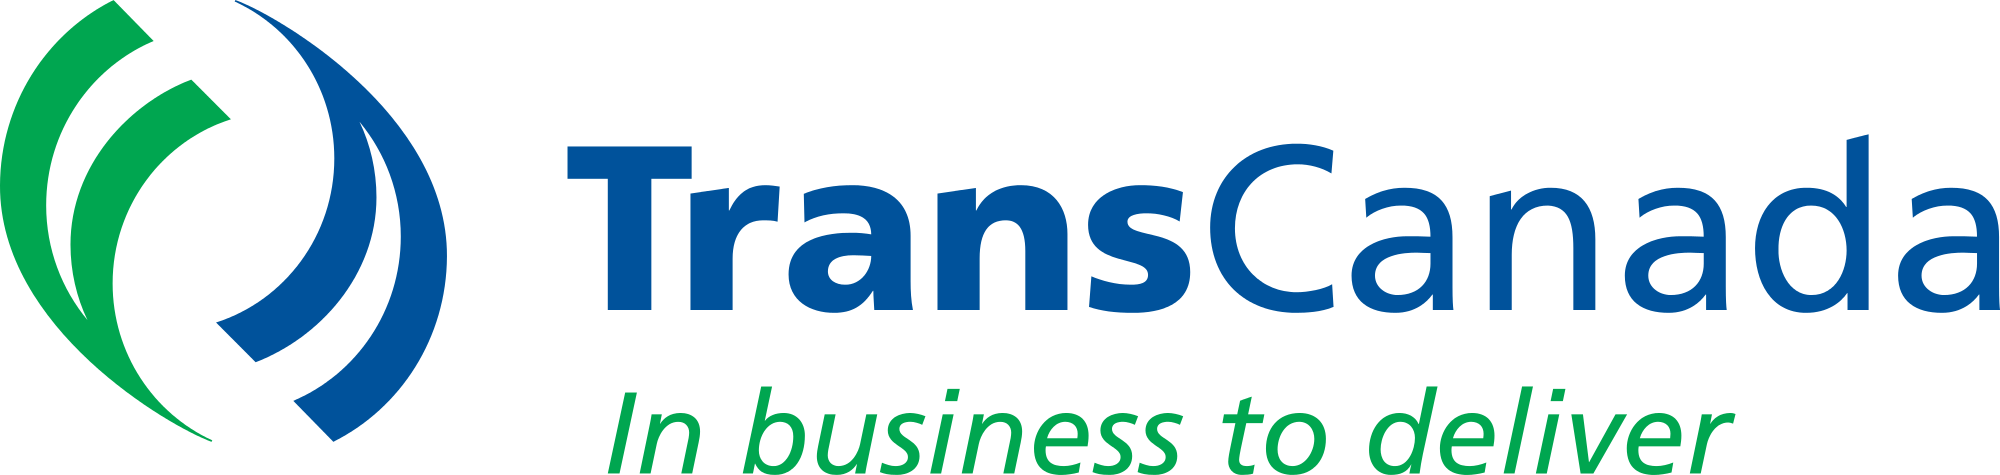 TransCanada.png